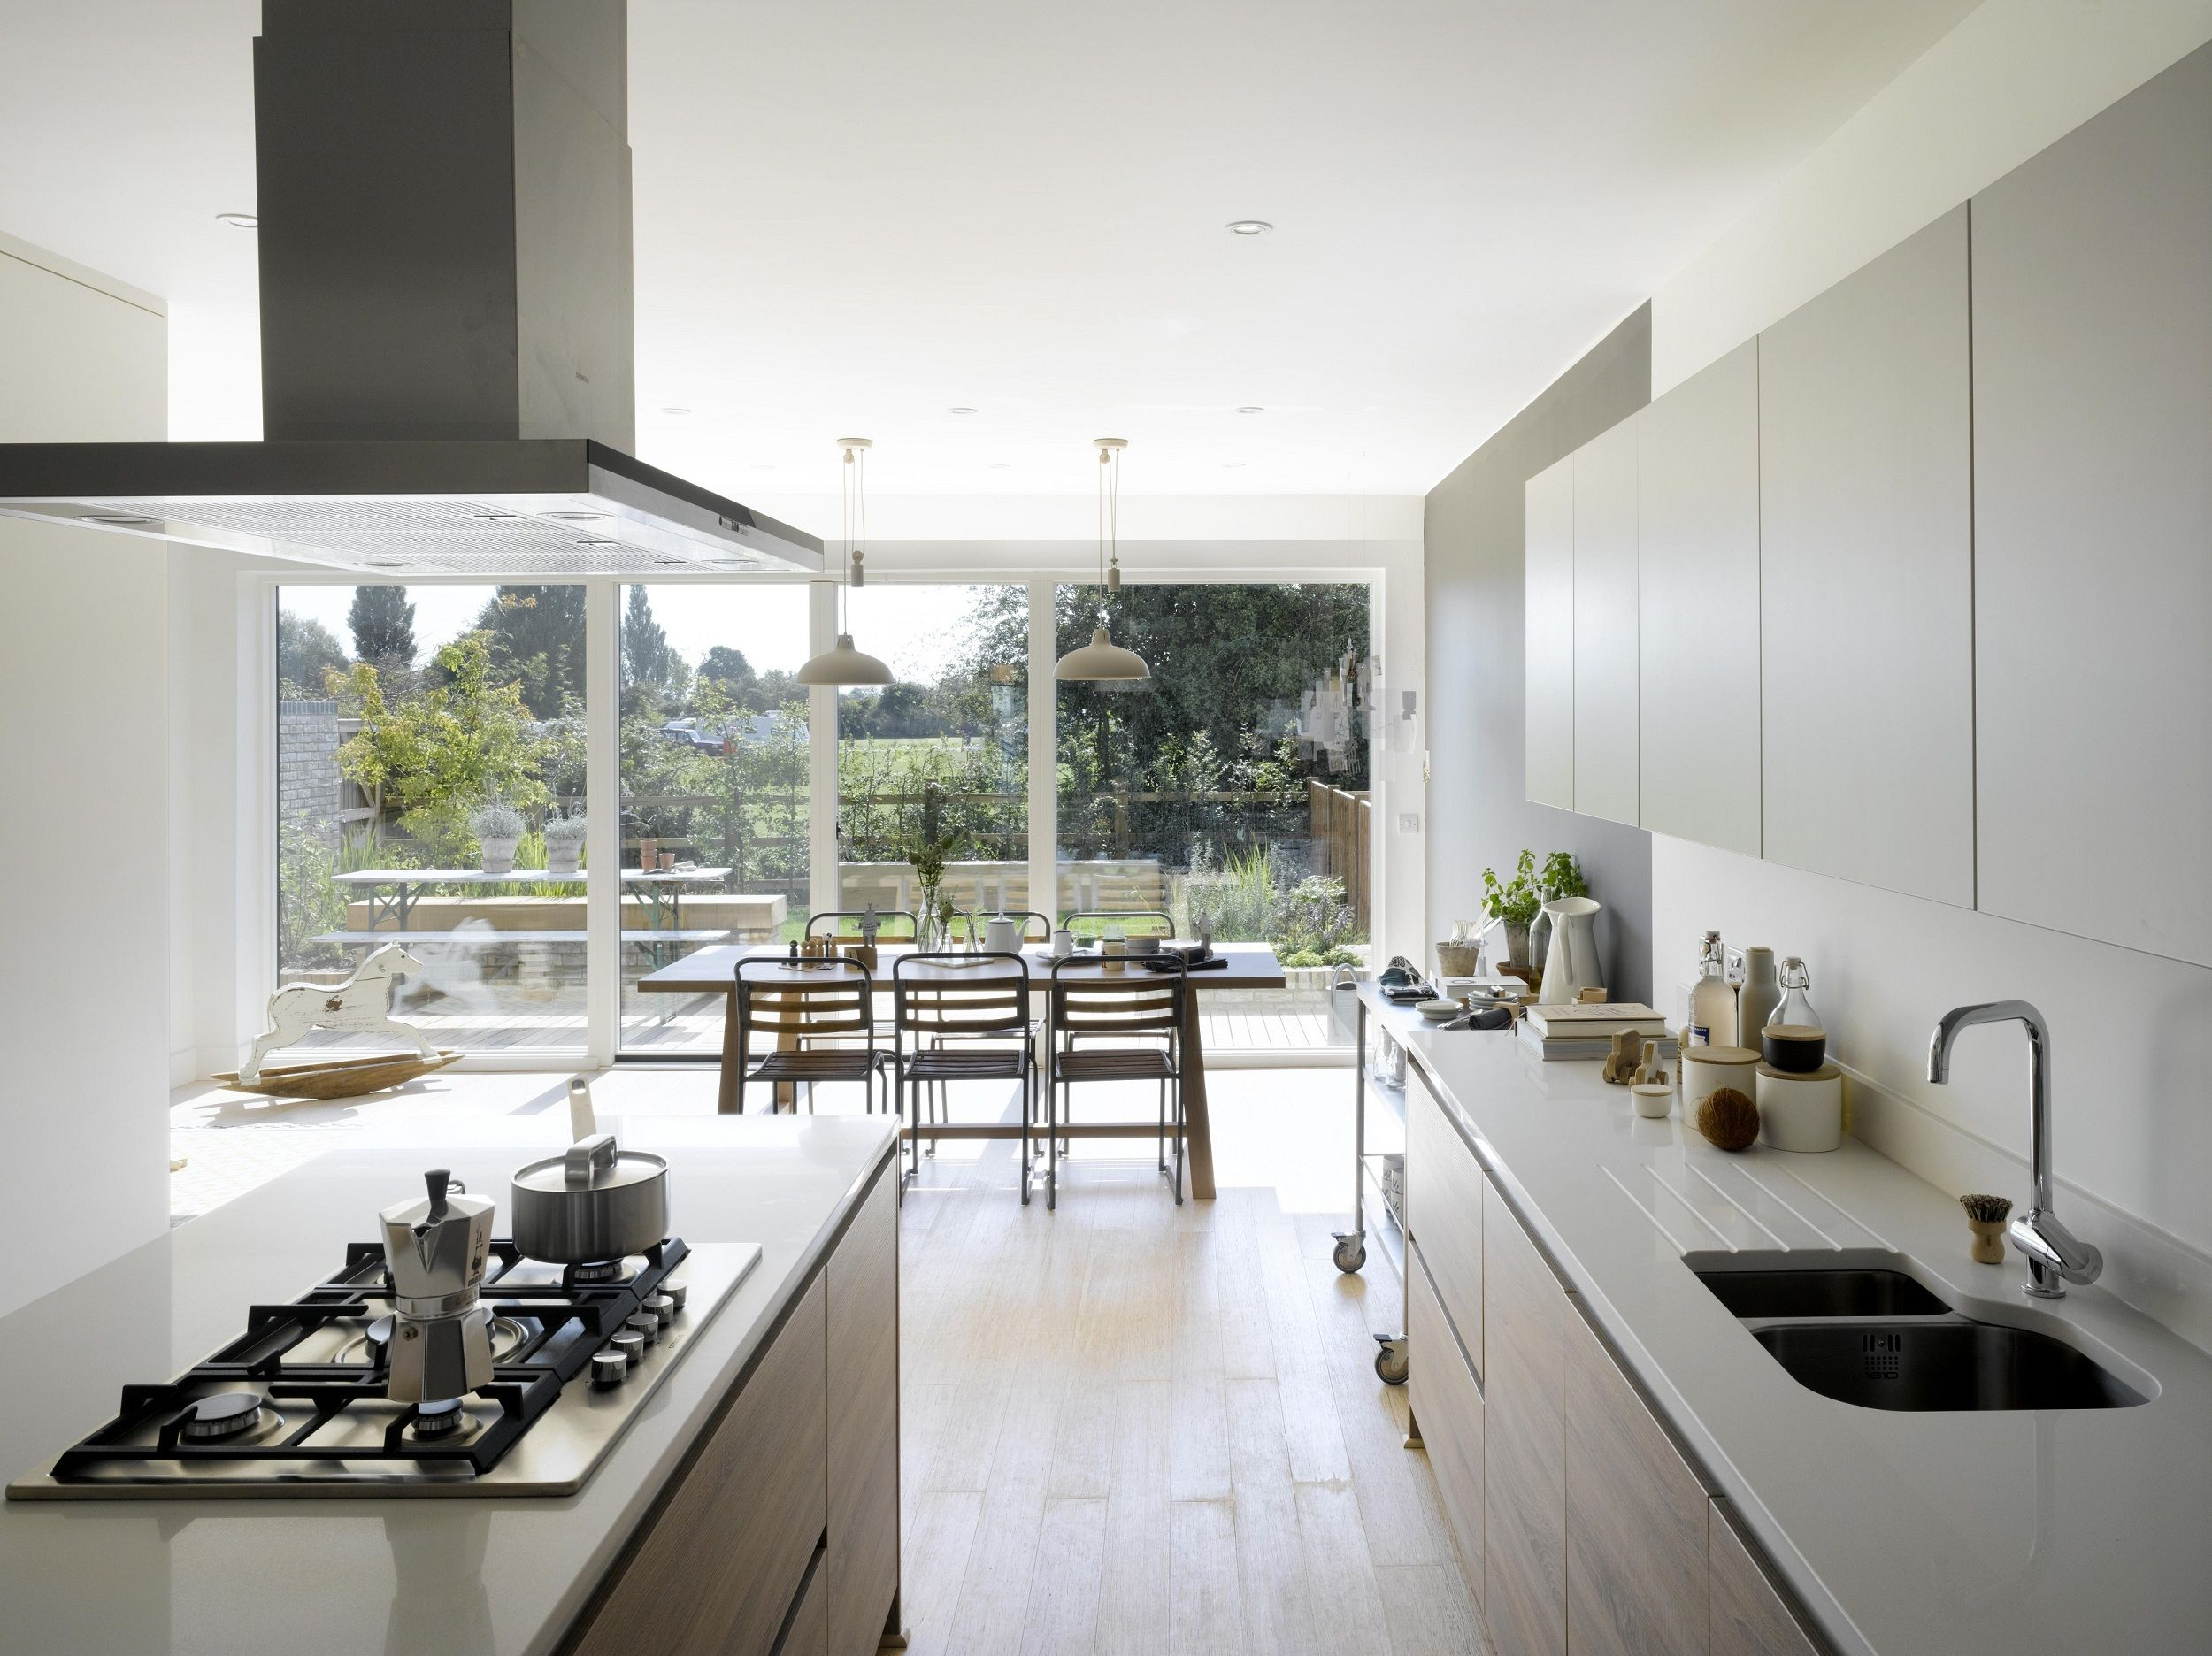 Architecture Homes By Skanska Seven Acres Show Home Kitchen View 1 ...